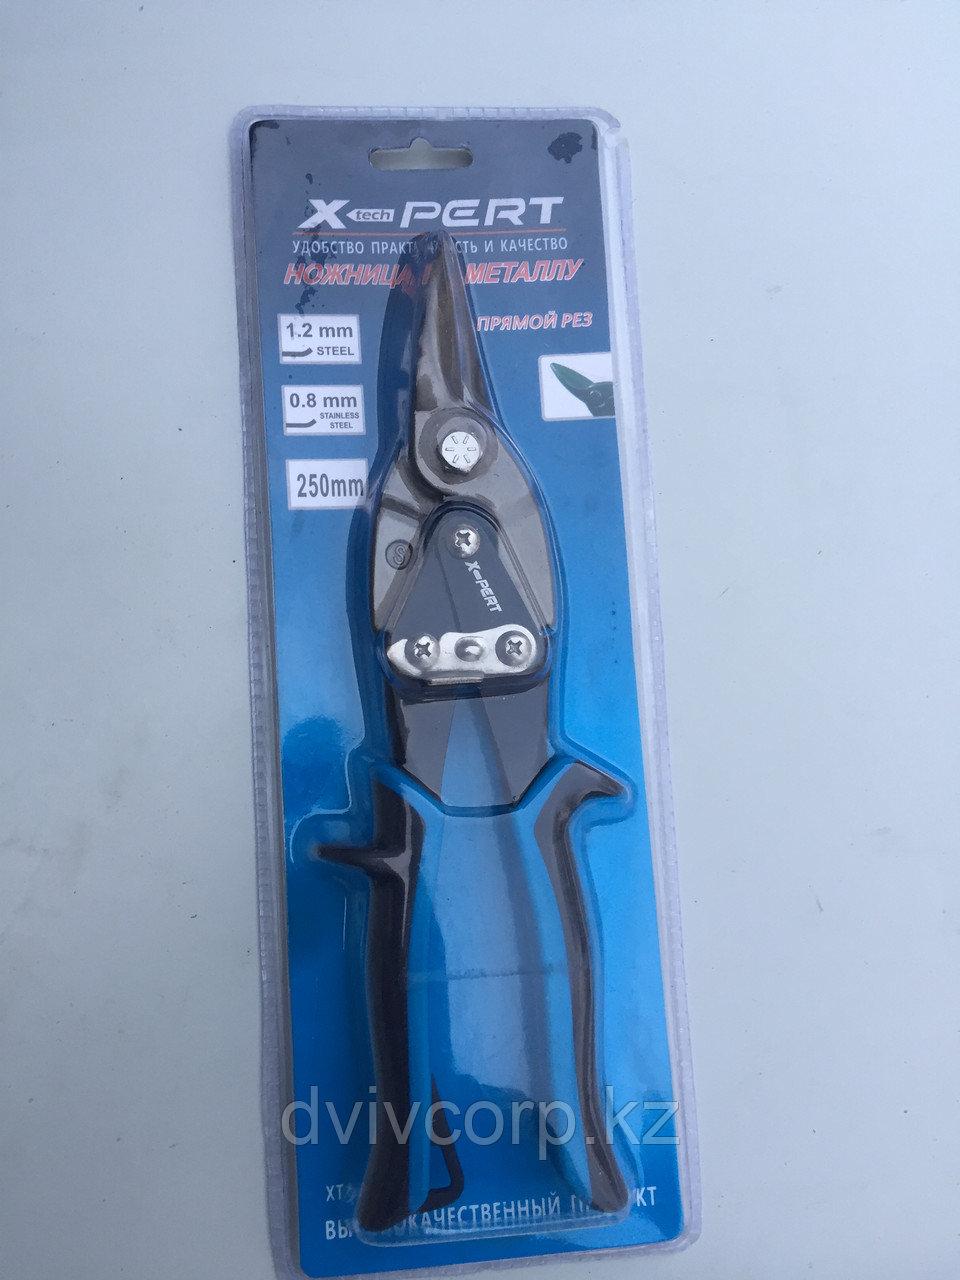 Ножницы по металлу 250 мм. Expert